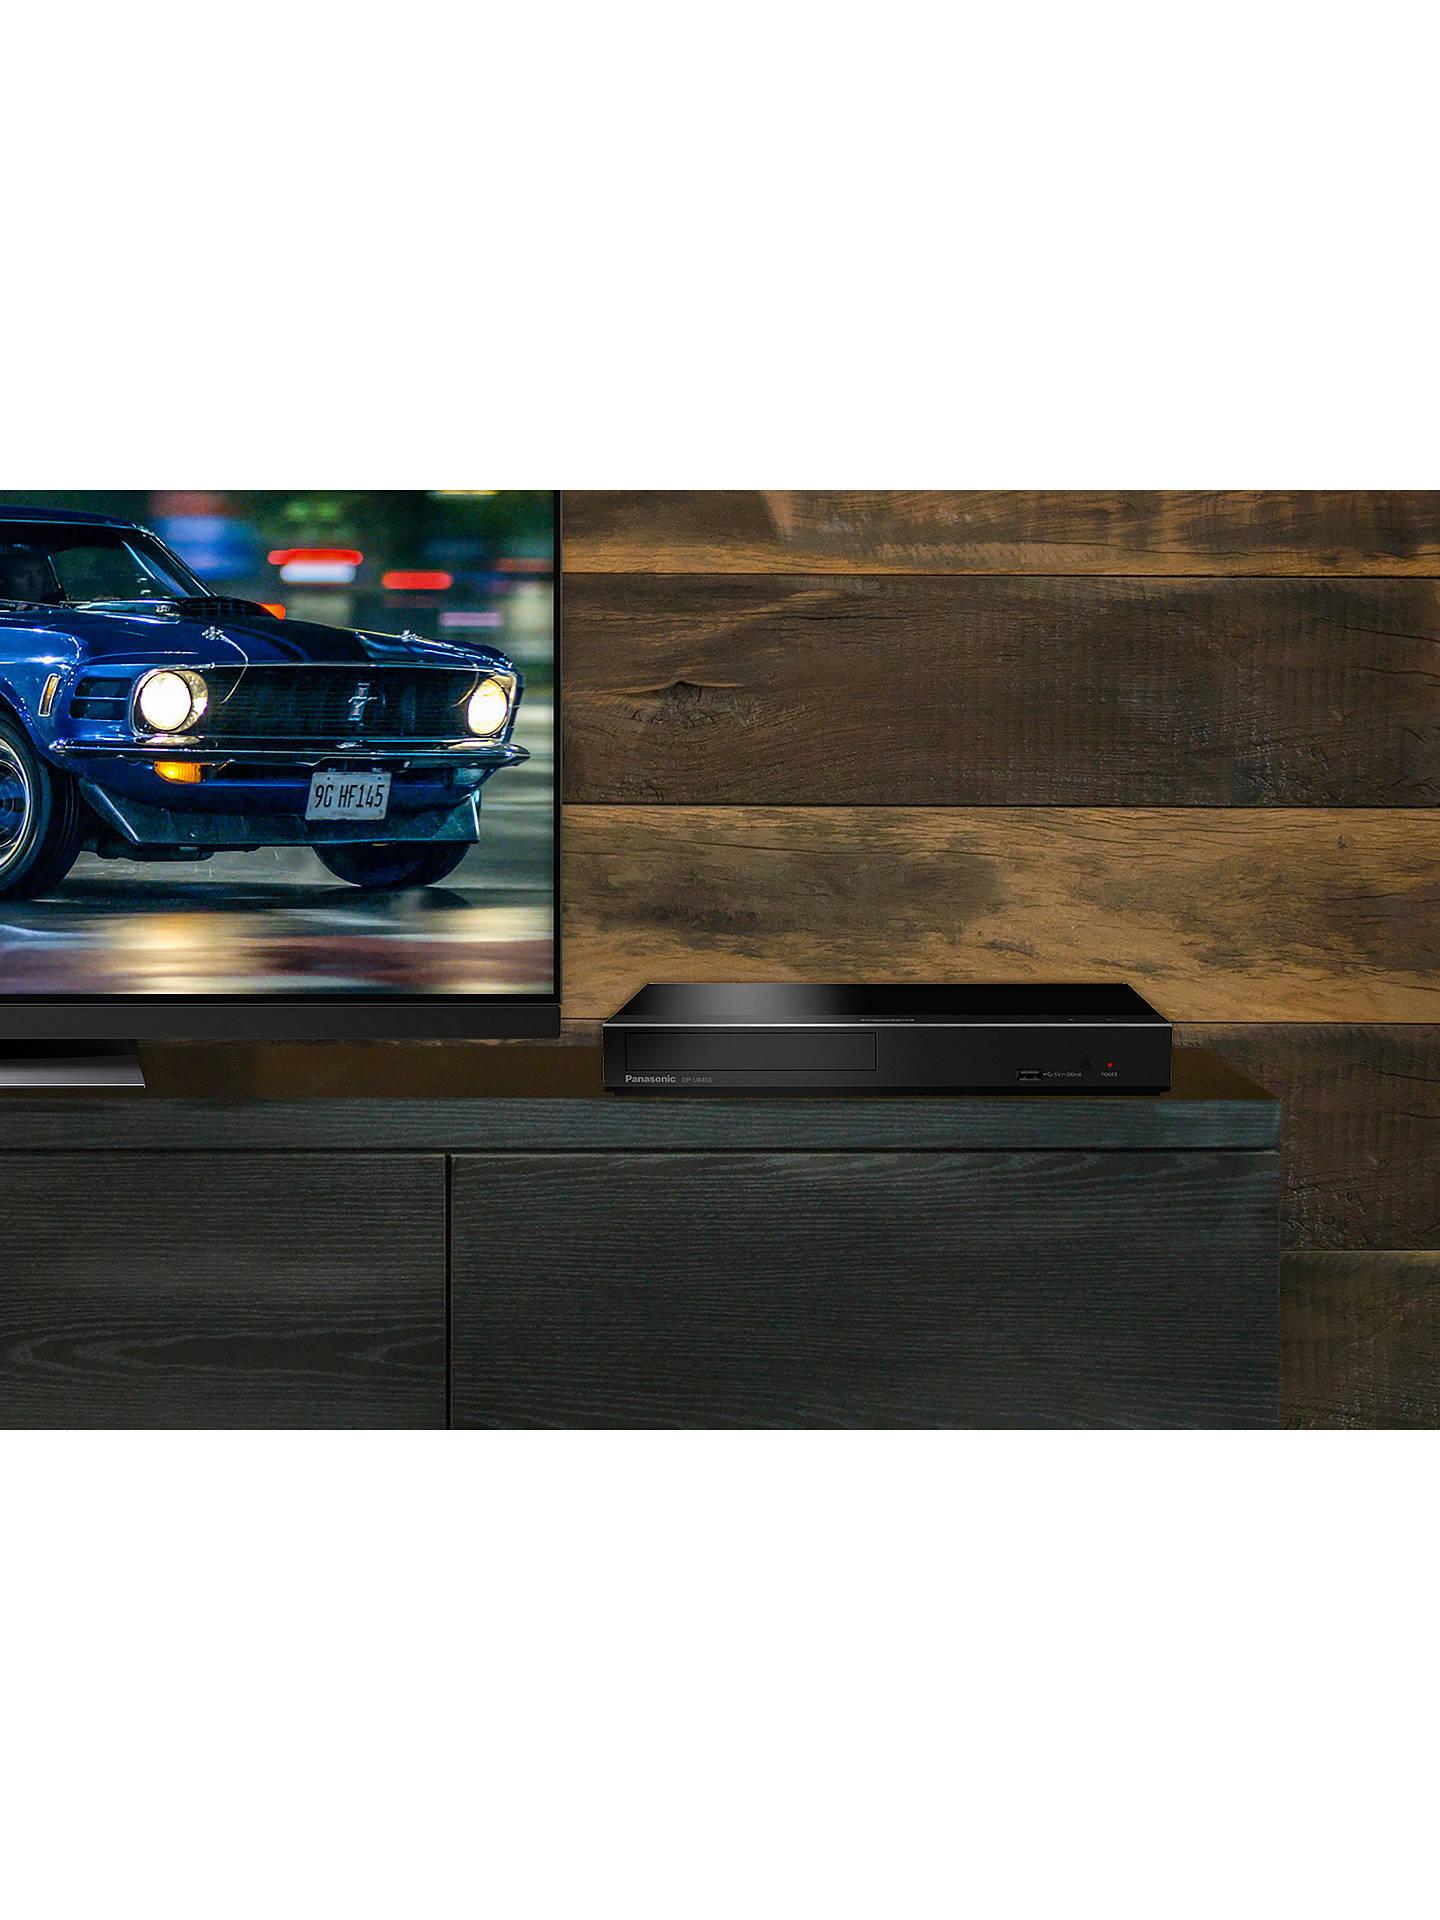 Panasonic DP-UB450EB 3D 4K UHD HDR Blu-Ray/DVD Player with High Resolution  Audio, Ultra HD Premium Certified